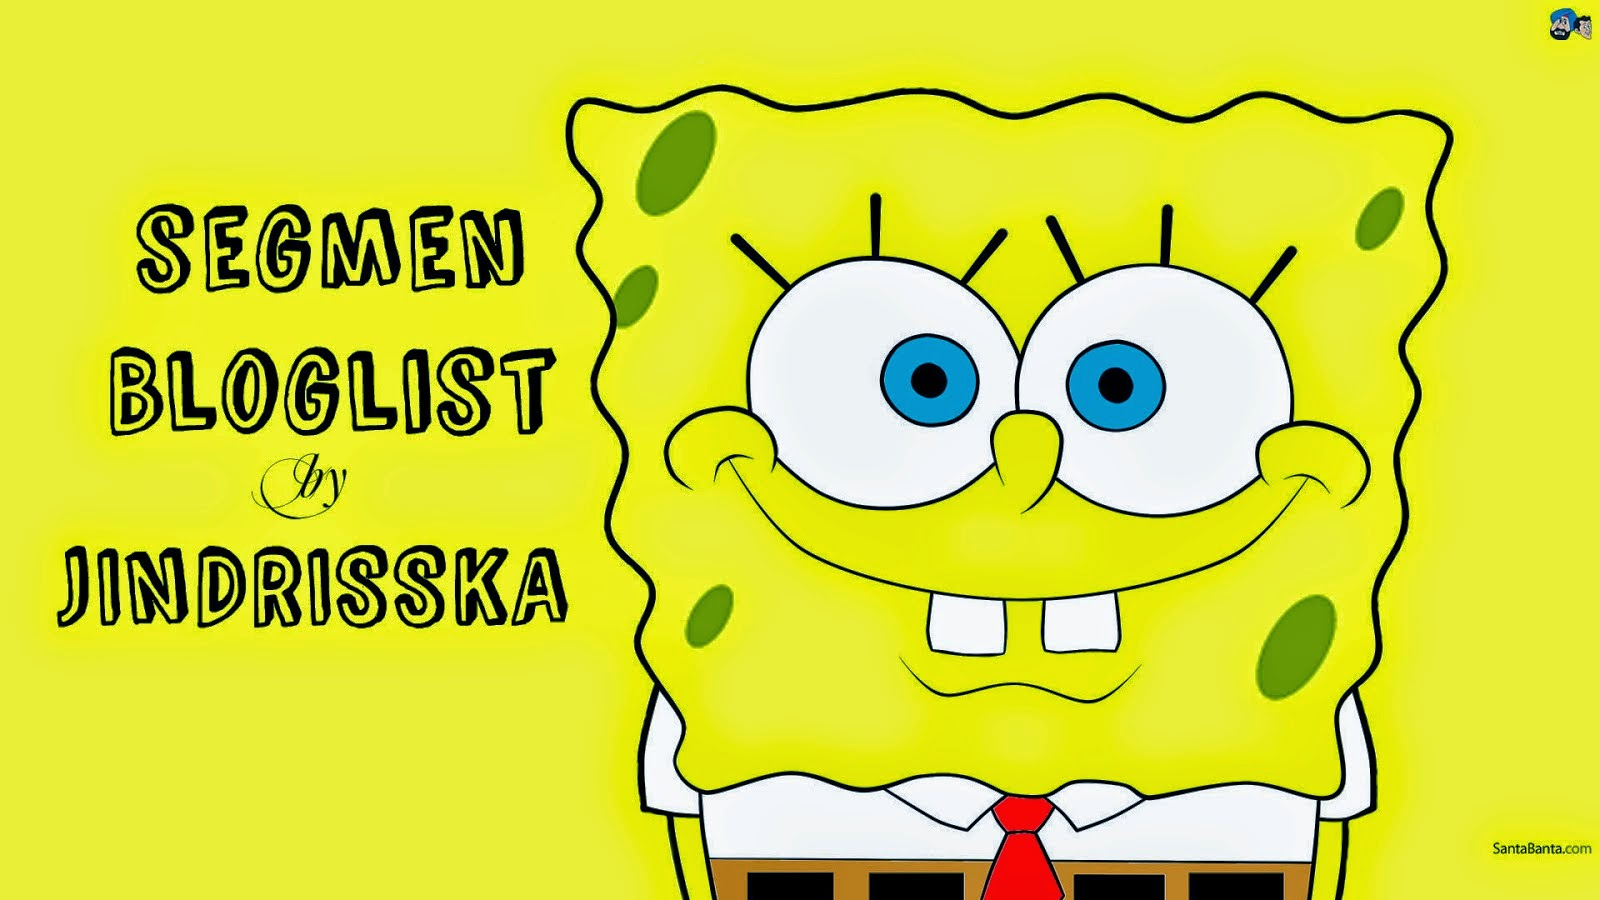 Segmen Bloglist by JINDRISSKA